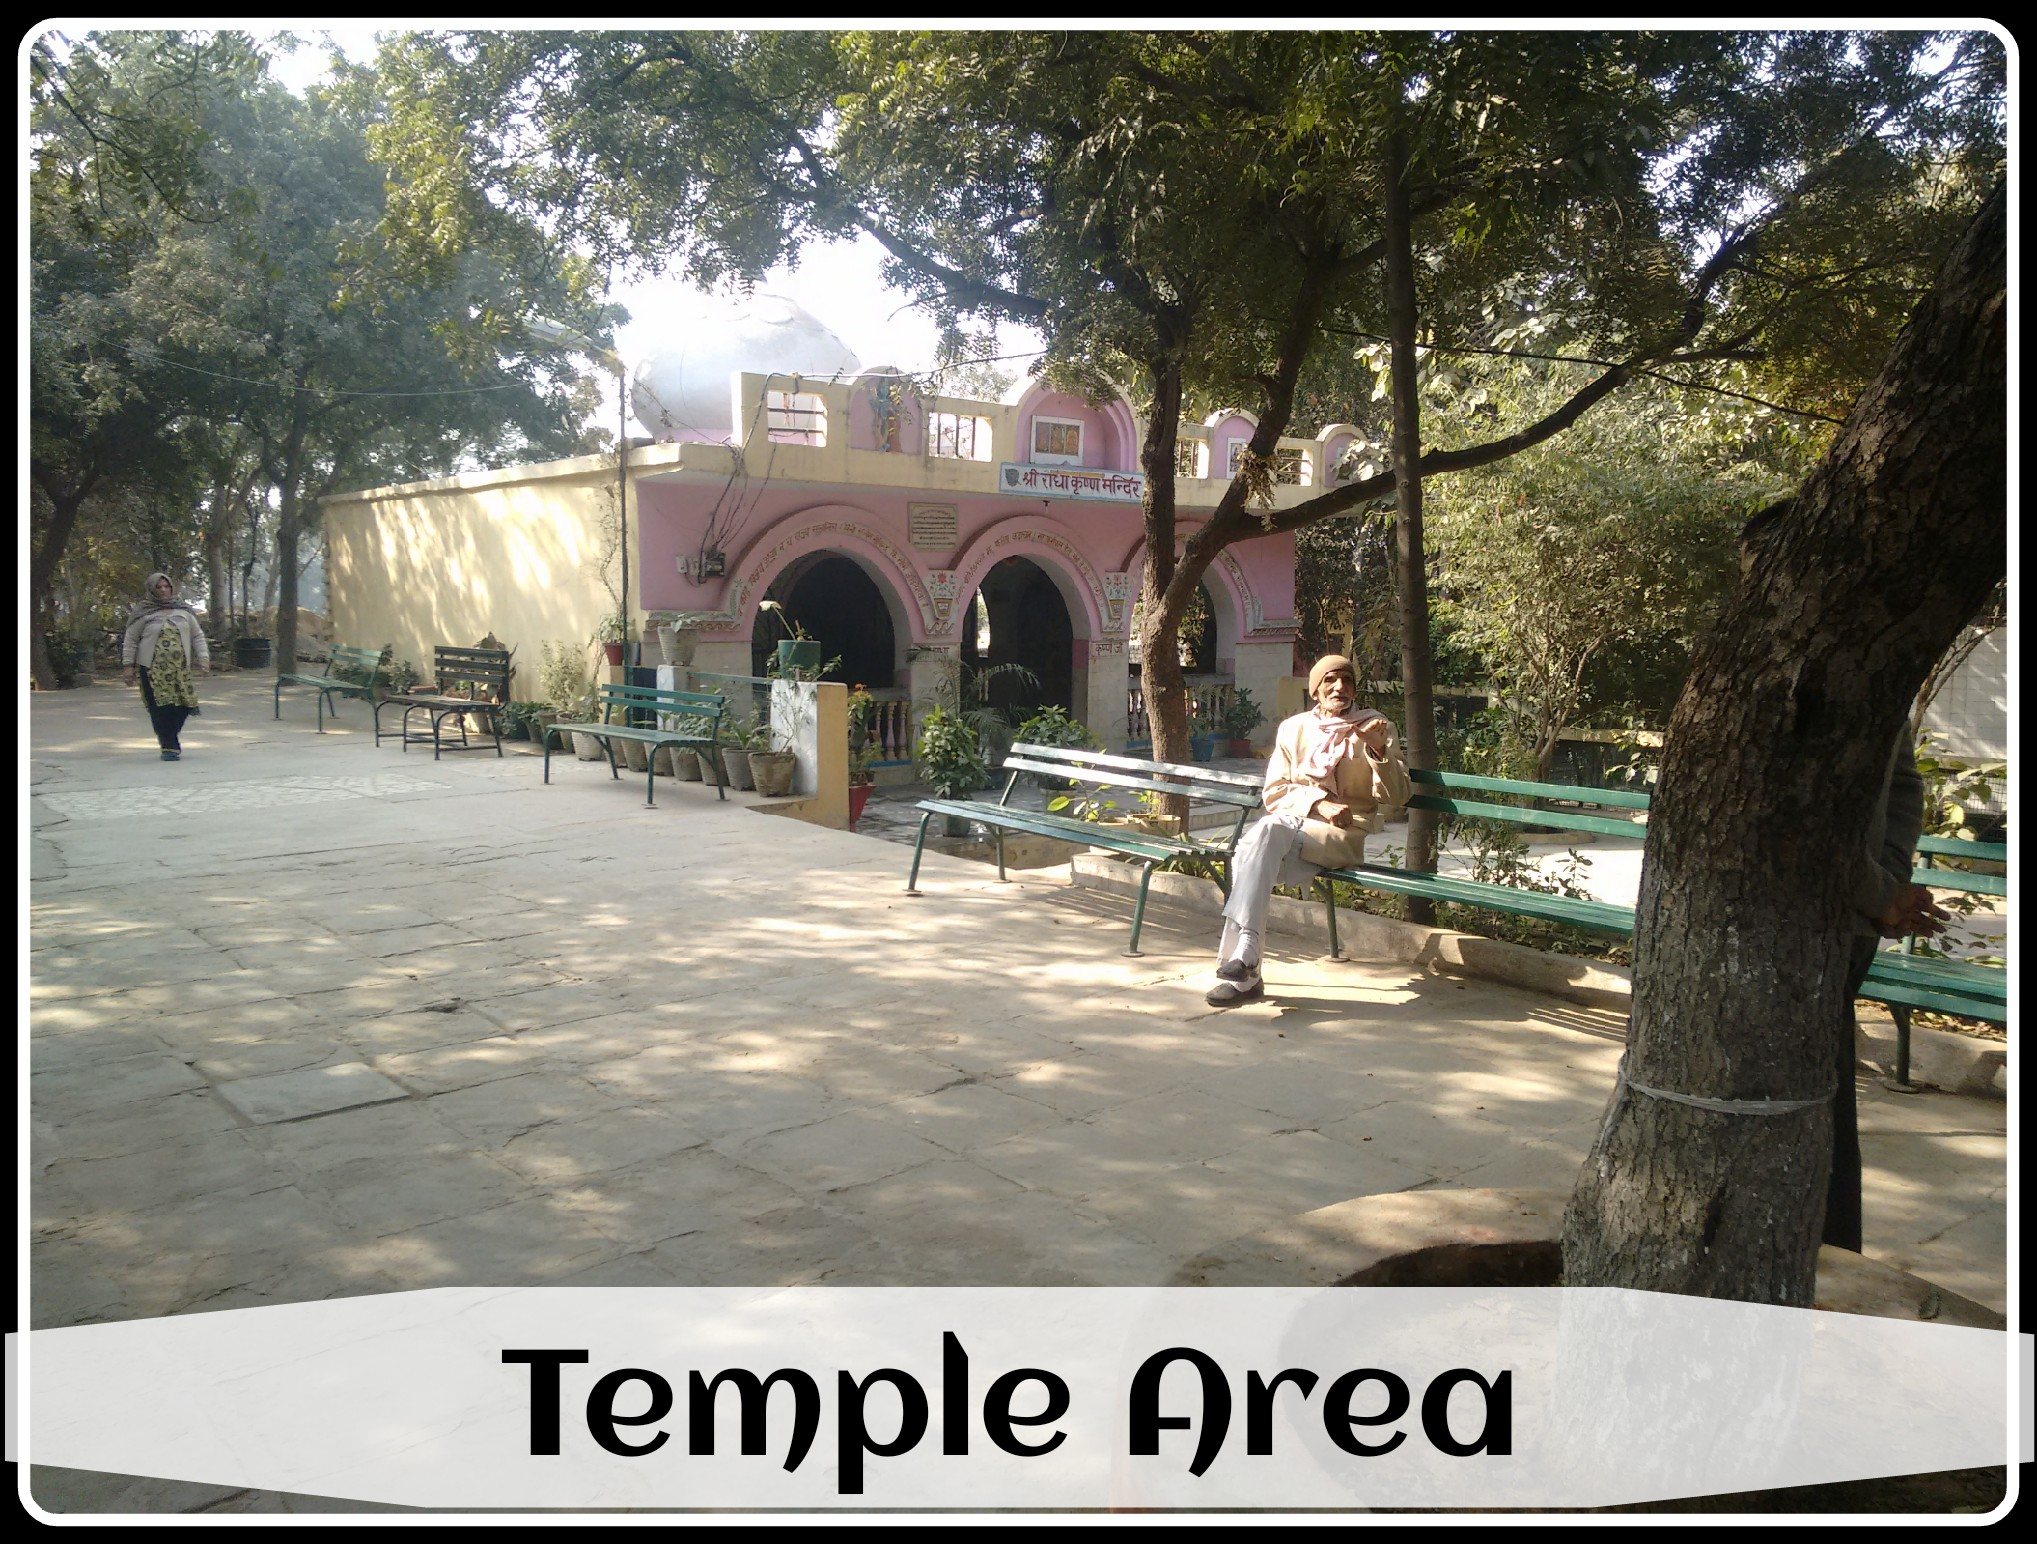 The temple area